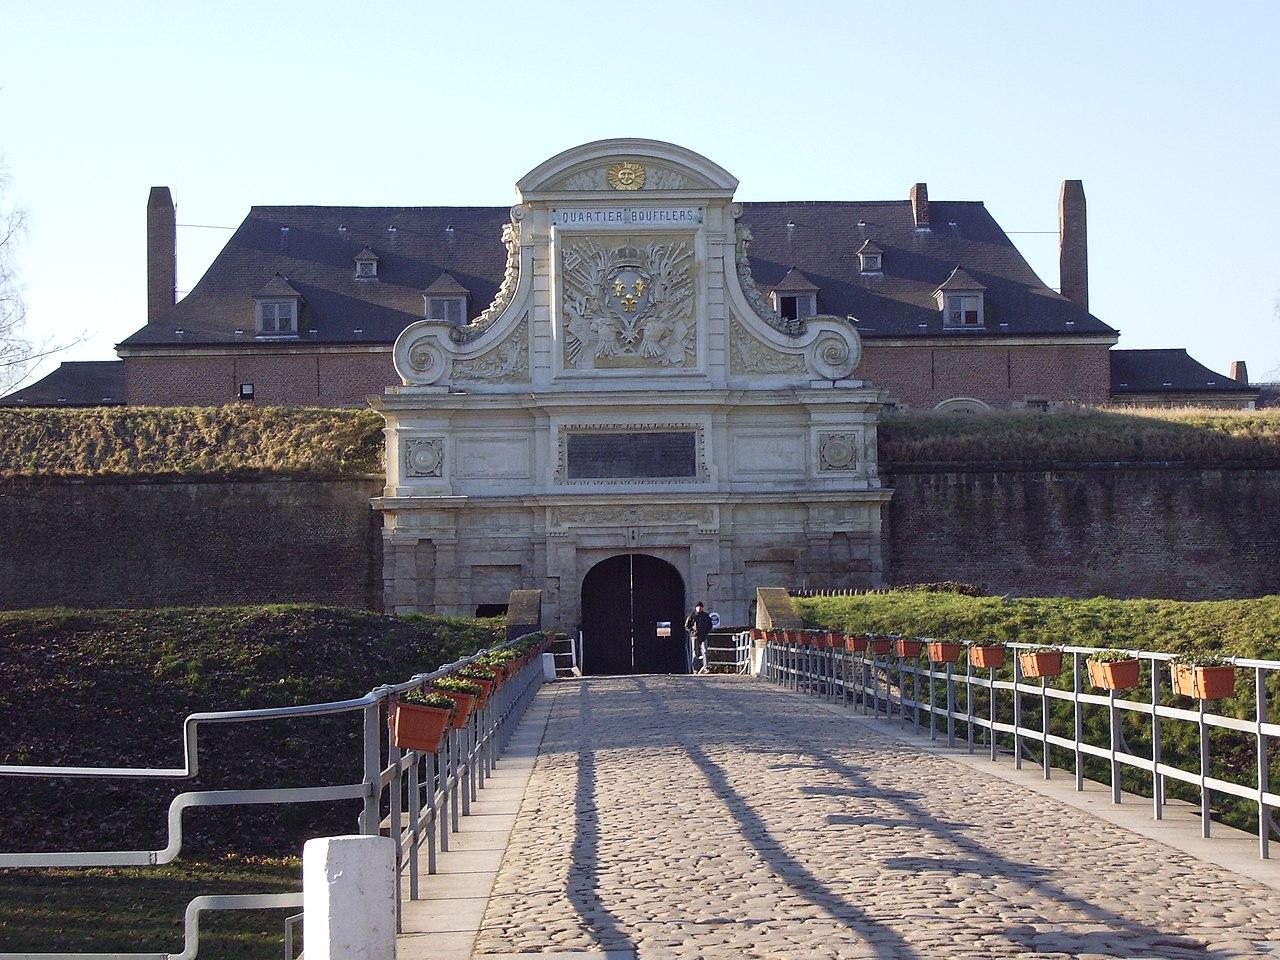 File:Citadelle de Vauban, Lille.JPG - Wikipedia